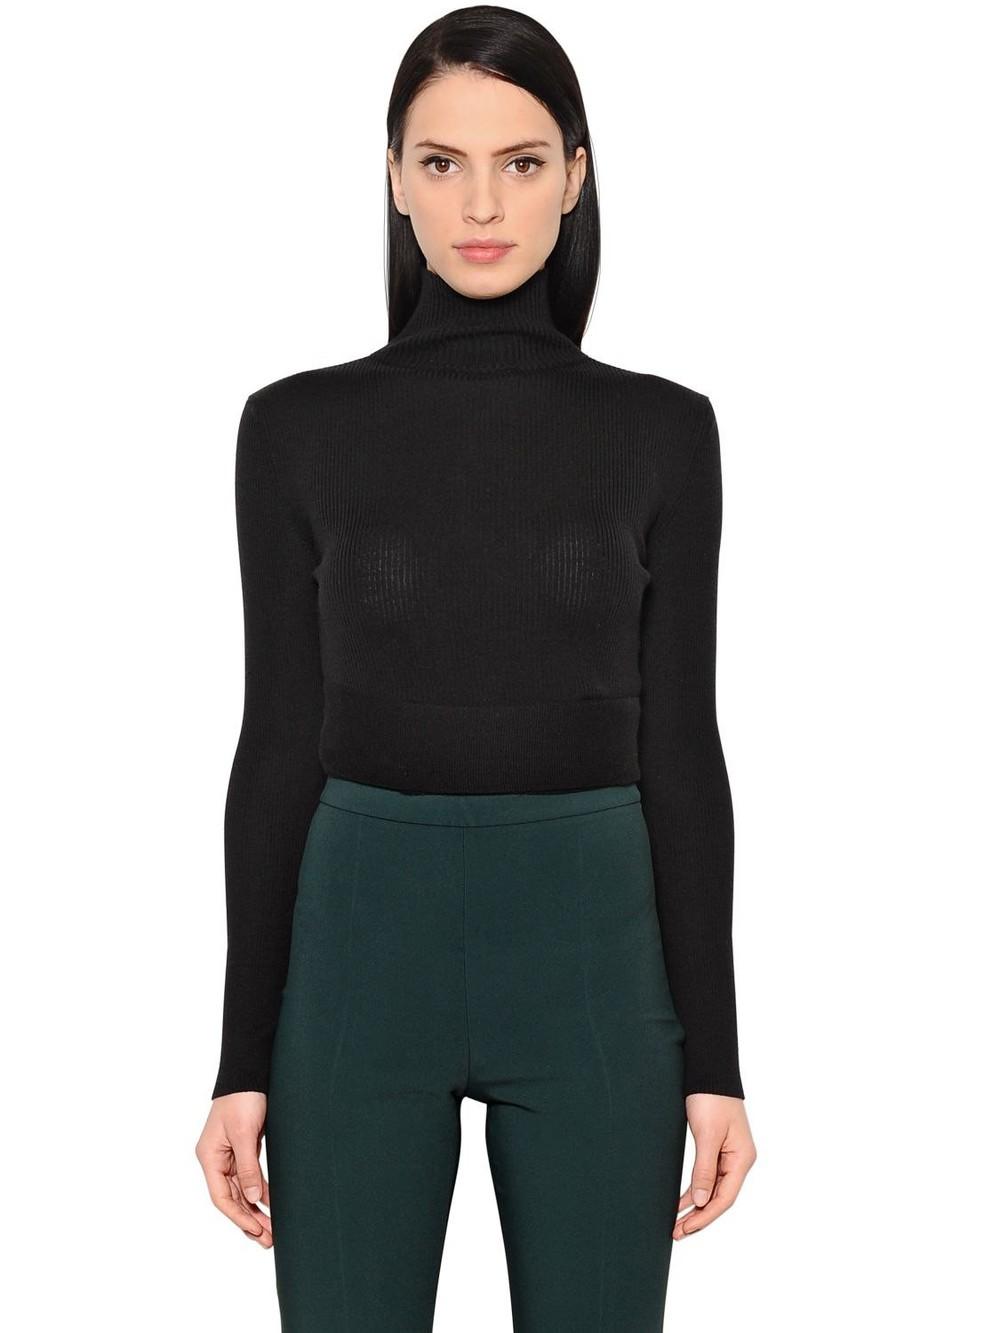 ANTONIO BERARDI Wool & Silk Cropped Sweater in black